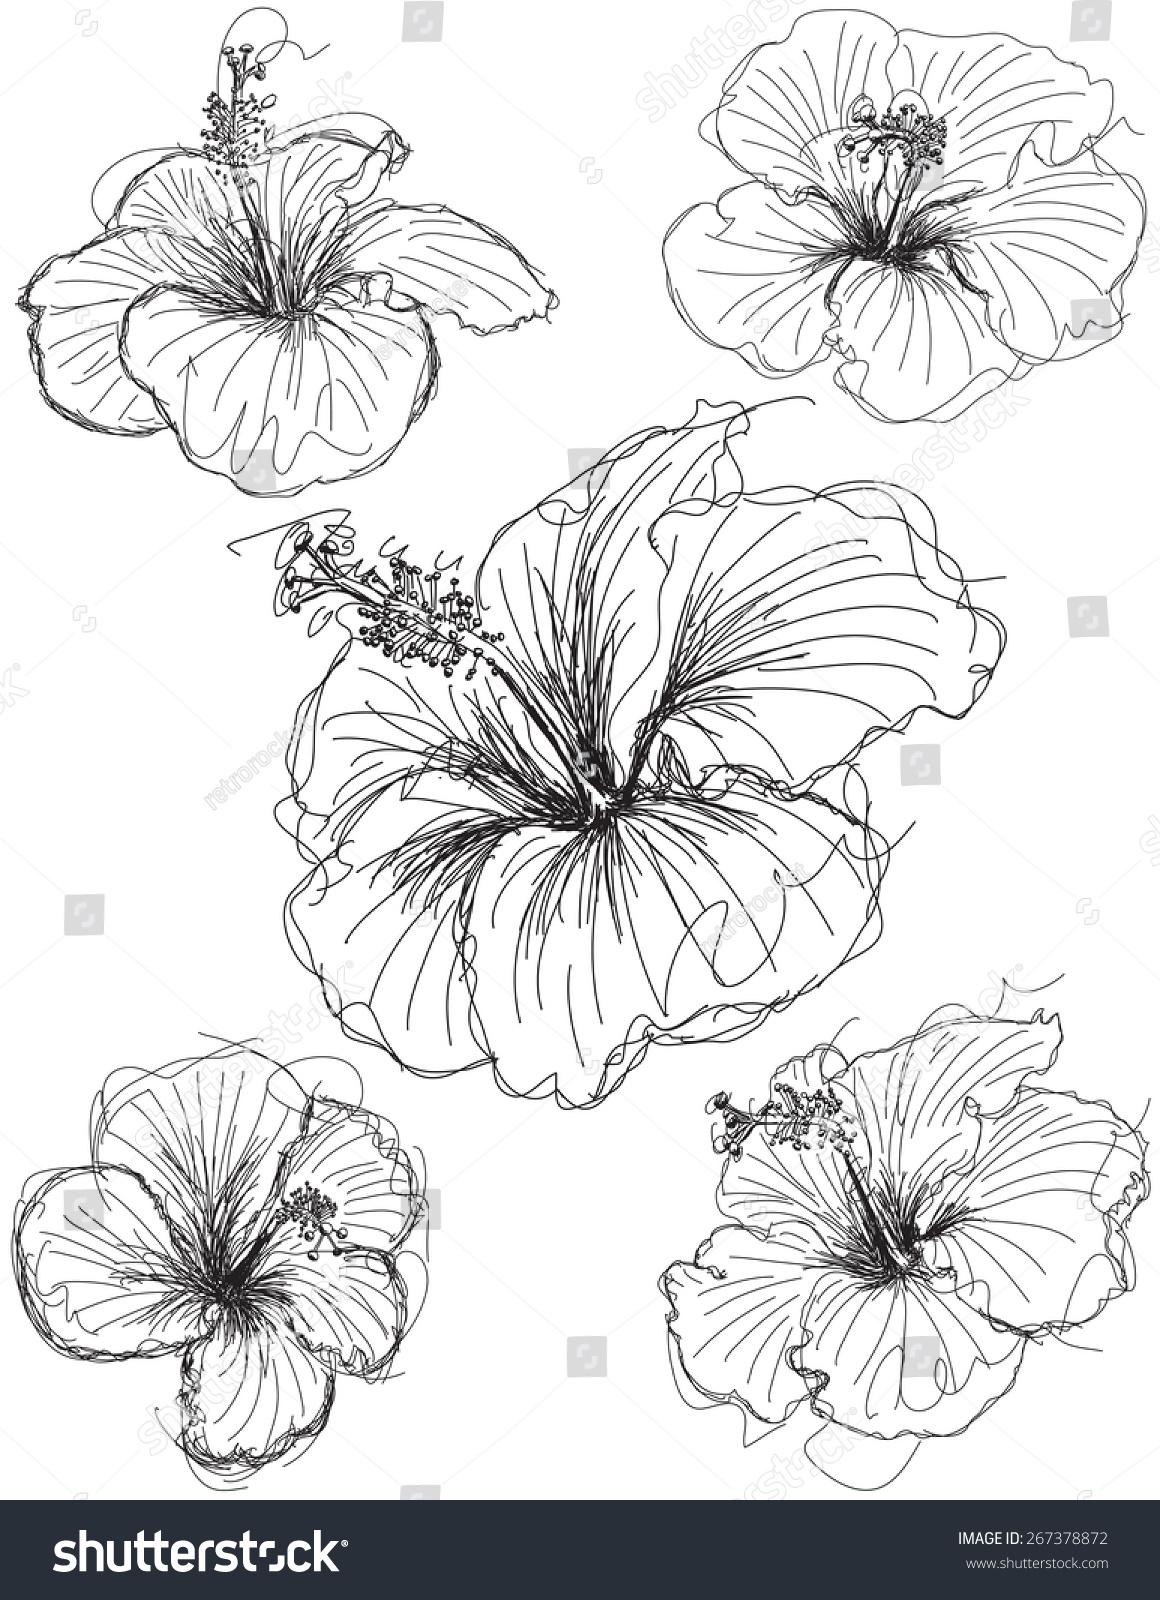 Hibiscus flower sketches hand drawn hibiscus stock vector royalty hibiscus flower sketches hand drawn hibiscus flower sketches izmirmasajfo